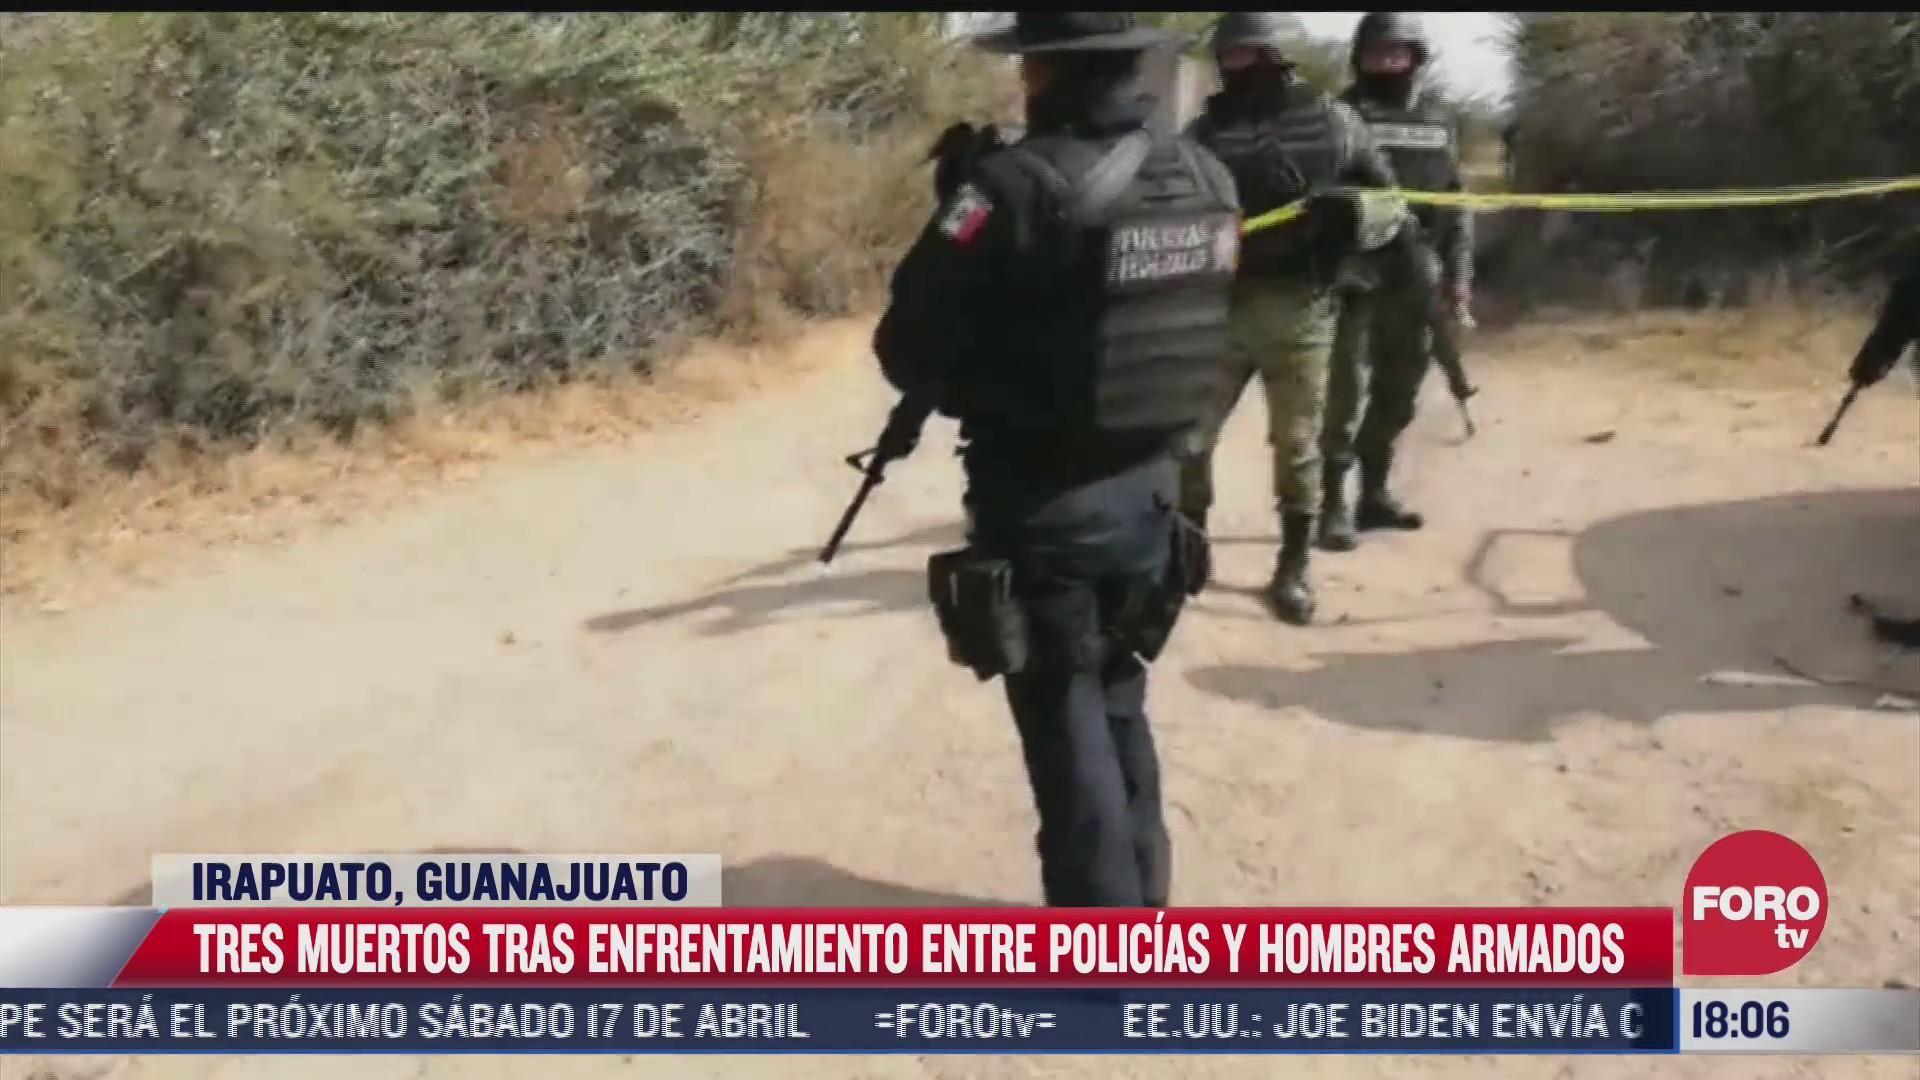 enfrentamiento deja 3 muertos en irapuato guanajuato